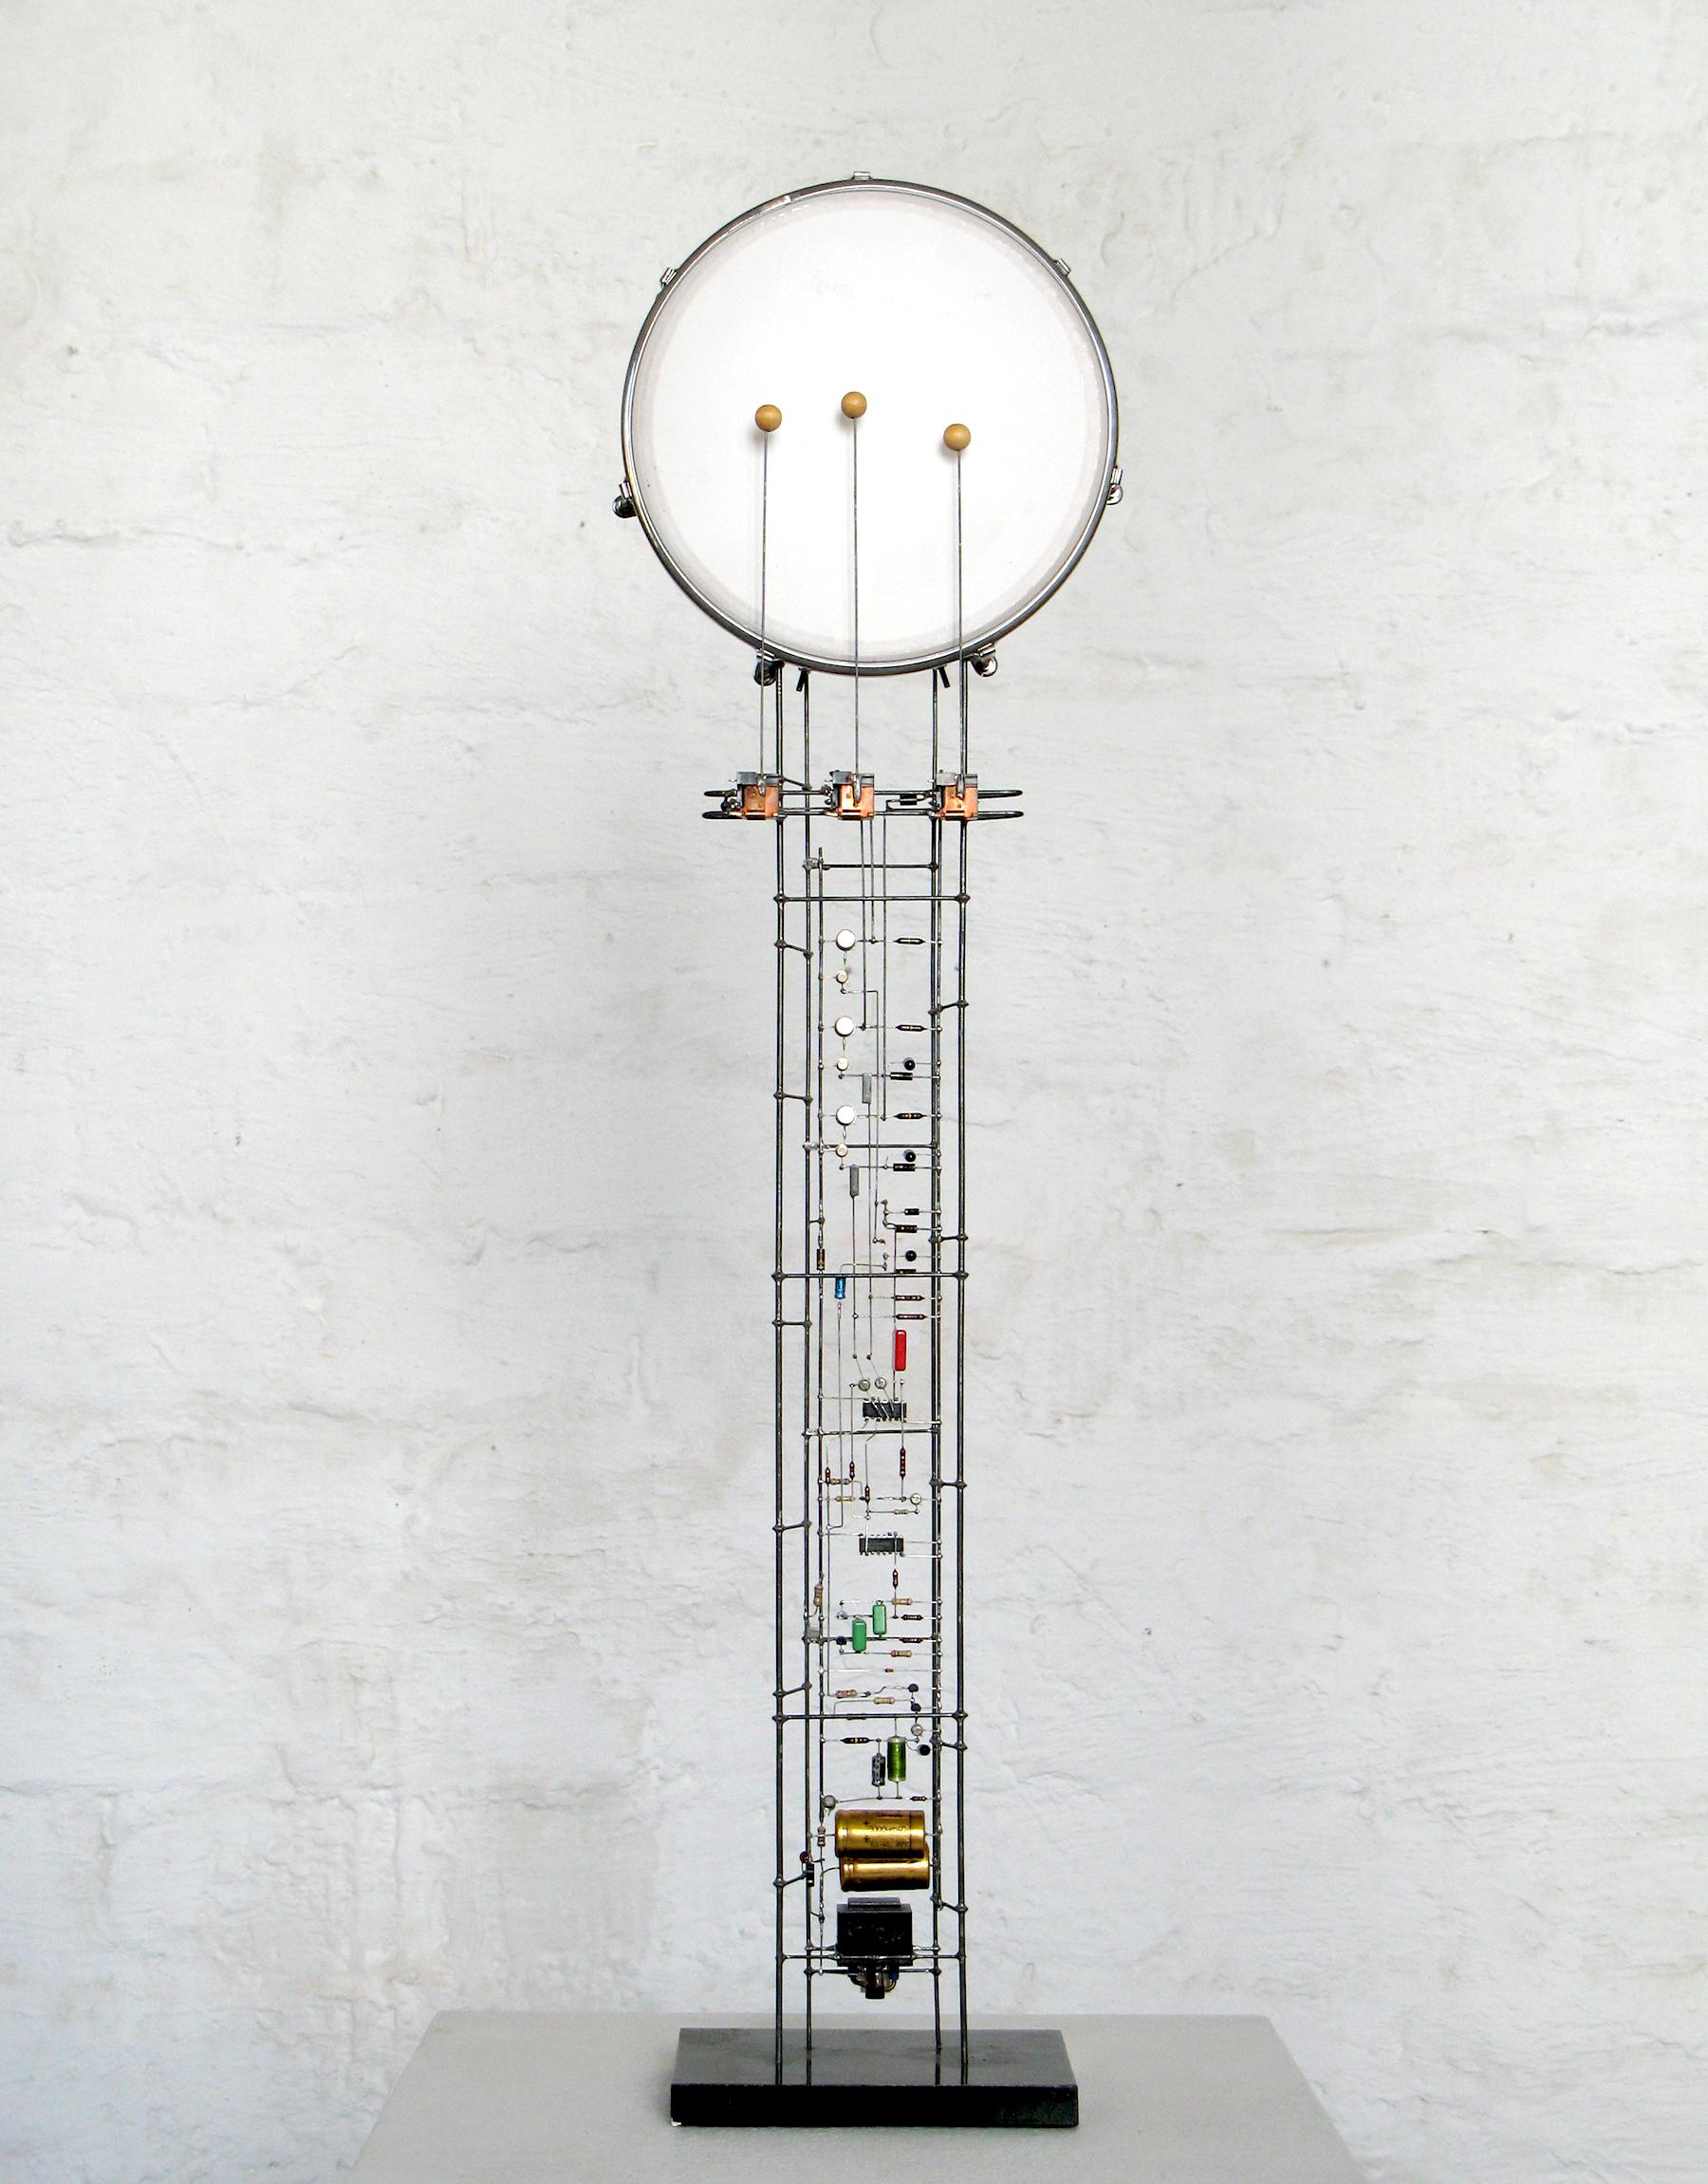 Peter Vogel, Tambourin, 1 Phz., 3 Klöppel, h: 84 cm, 2000